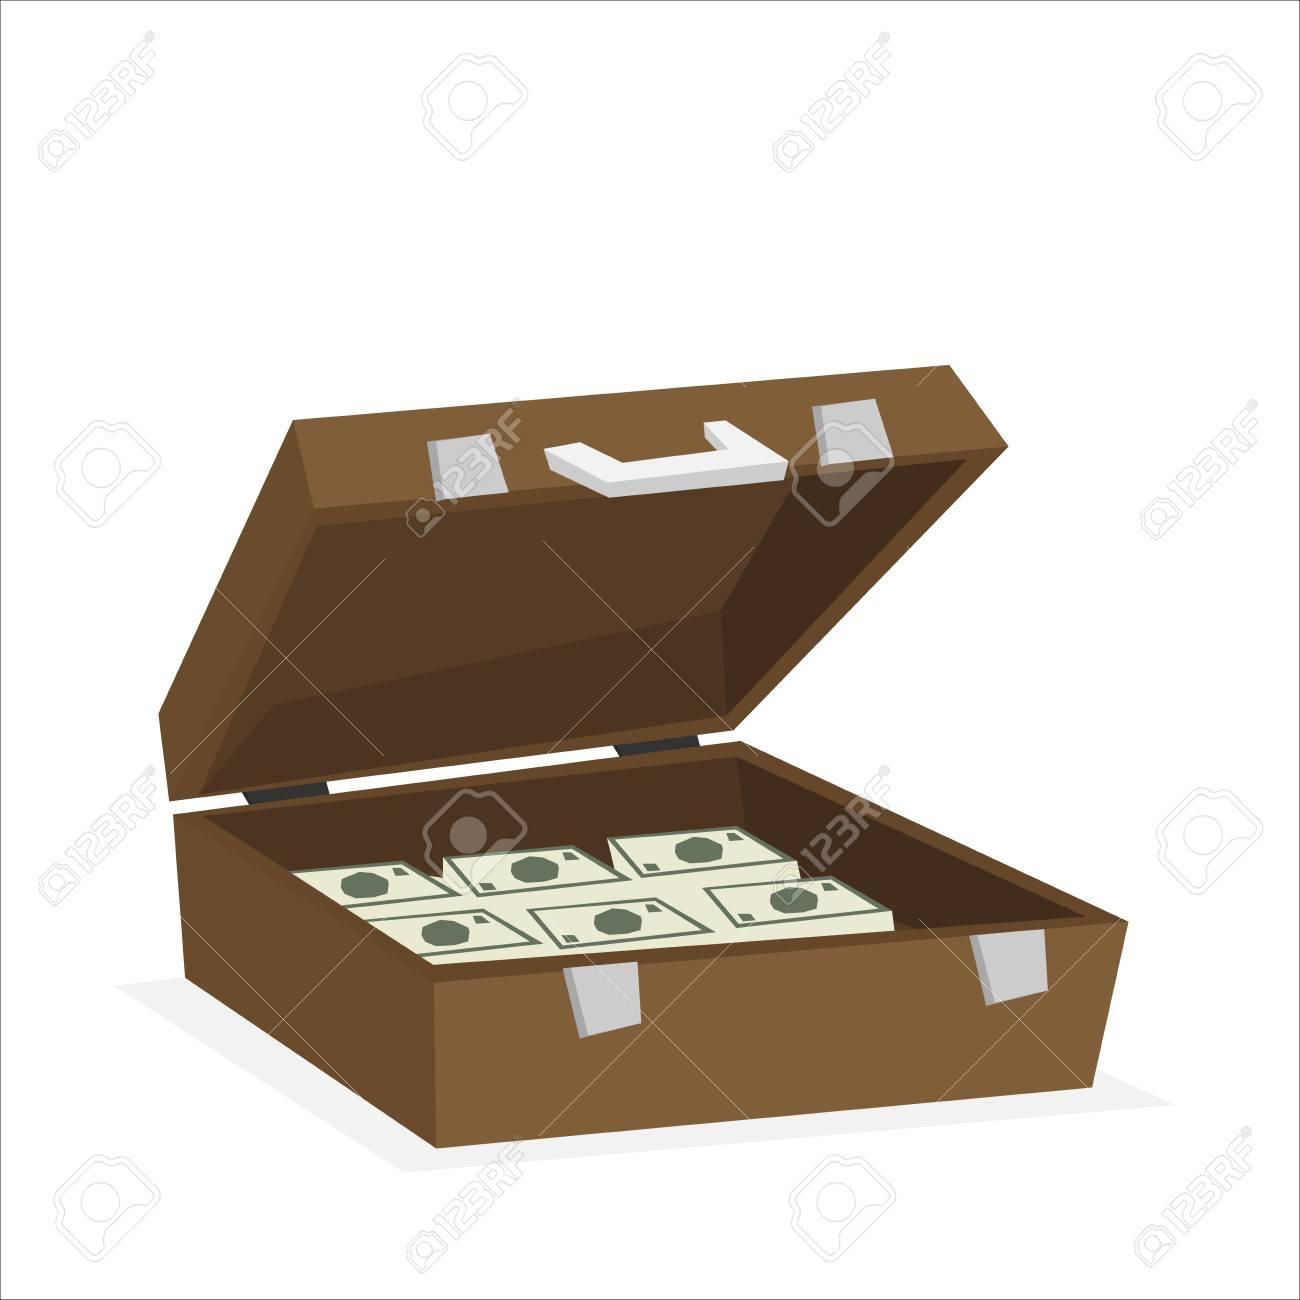 Case full of money isolated on background. Vector illustration - 122861403